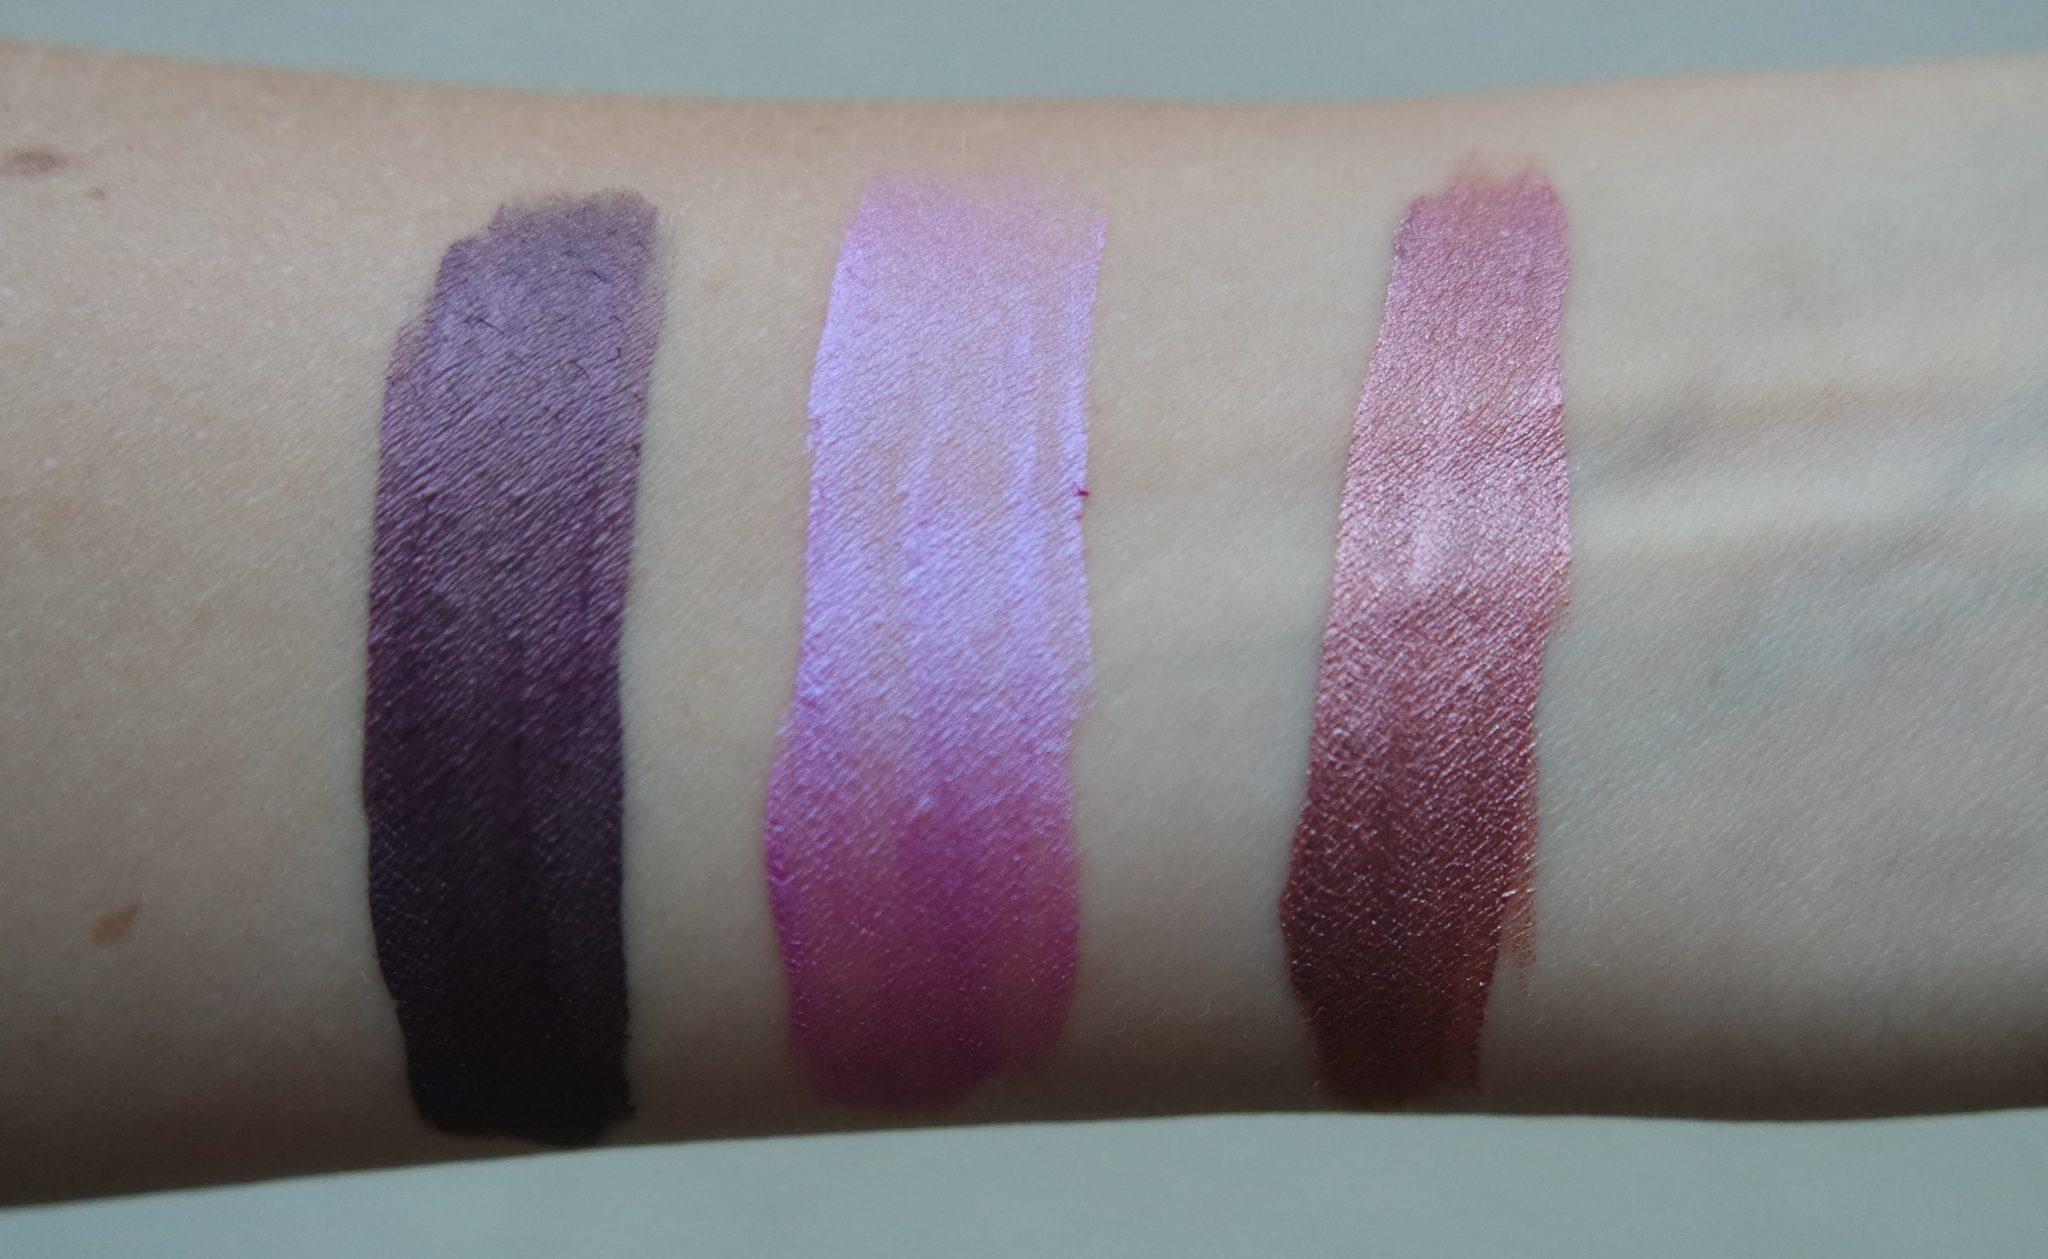 ofra liquid lipstick swatches monaco wonderland napa valley